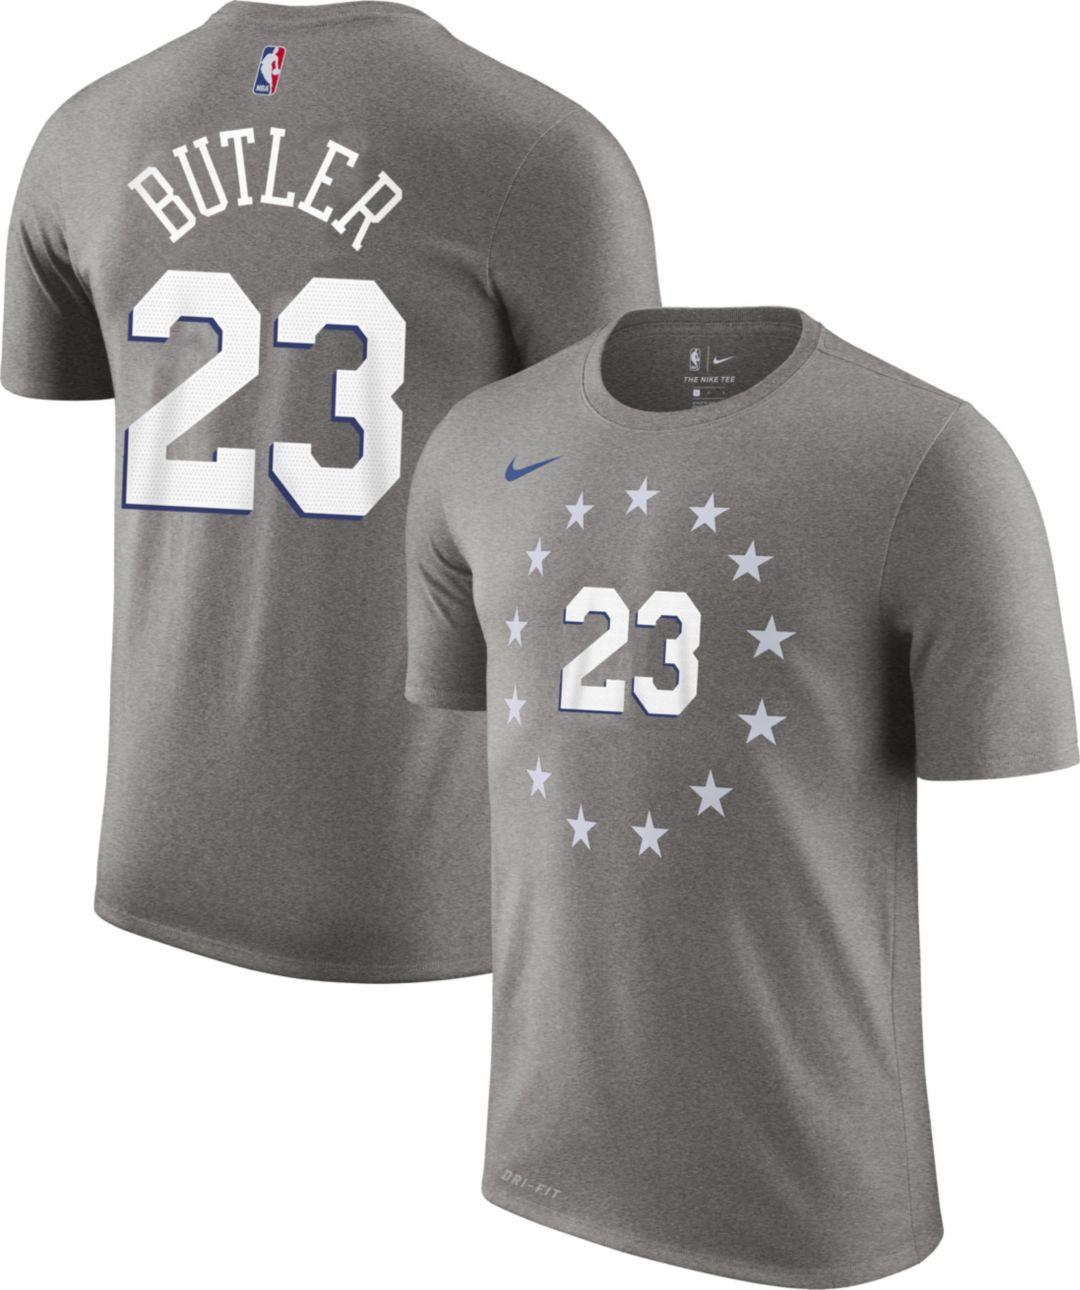 a20b888c Nike Youth Philadelphia 76ers Jimmy Butler Dri-FIT City Edition T-Shirt 1